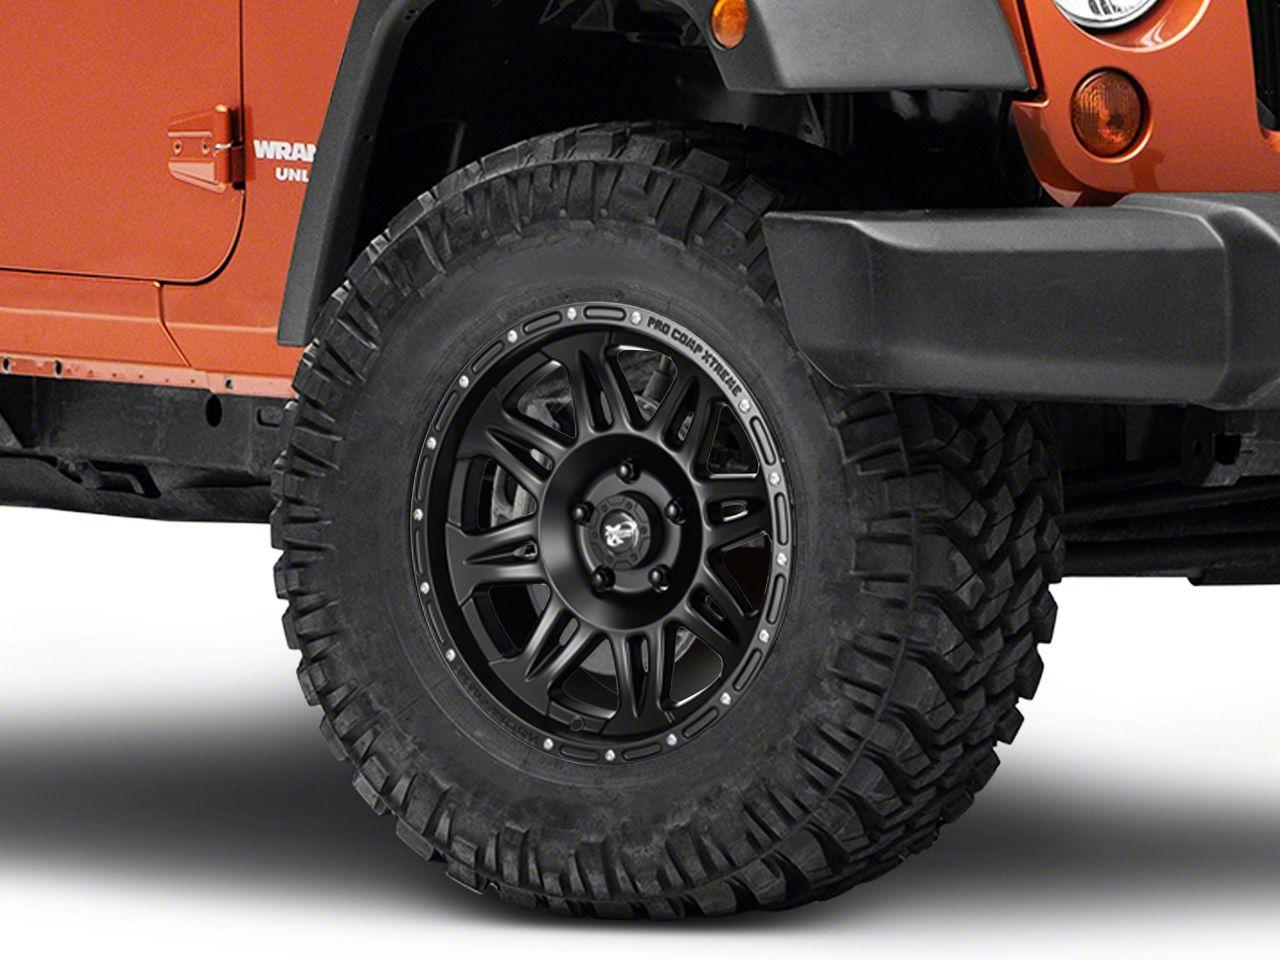 Pro Comp Alloy Series 7005 Flat Black Wheel - 17x9 (07-18 Jeep Wrangler JK; 2018 Jeep Wrangler JL)